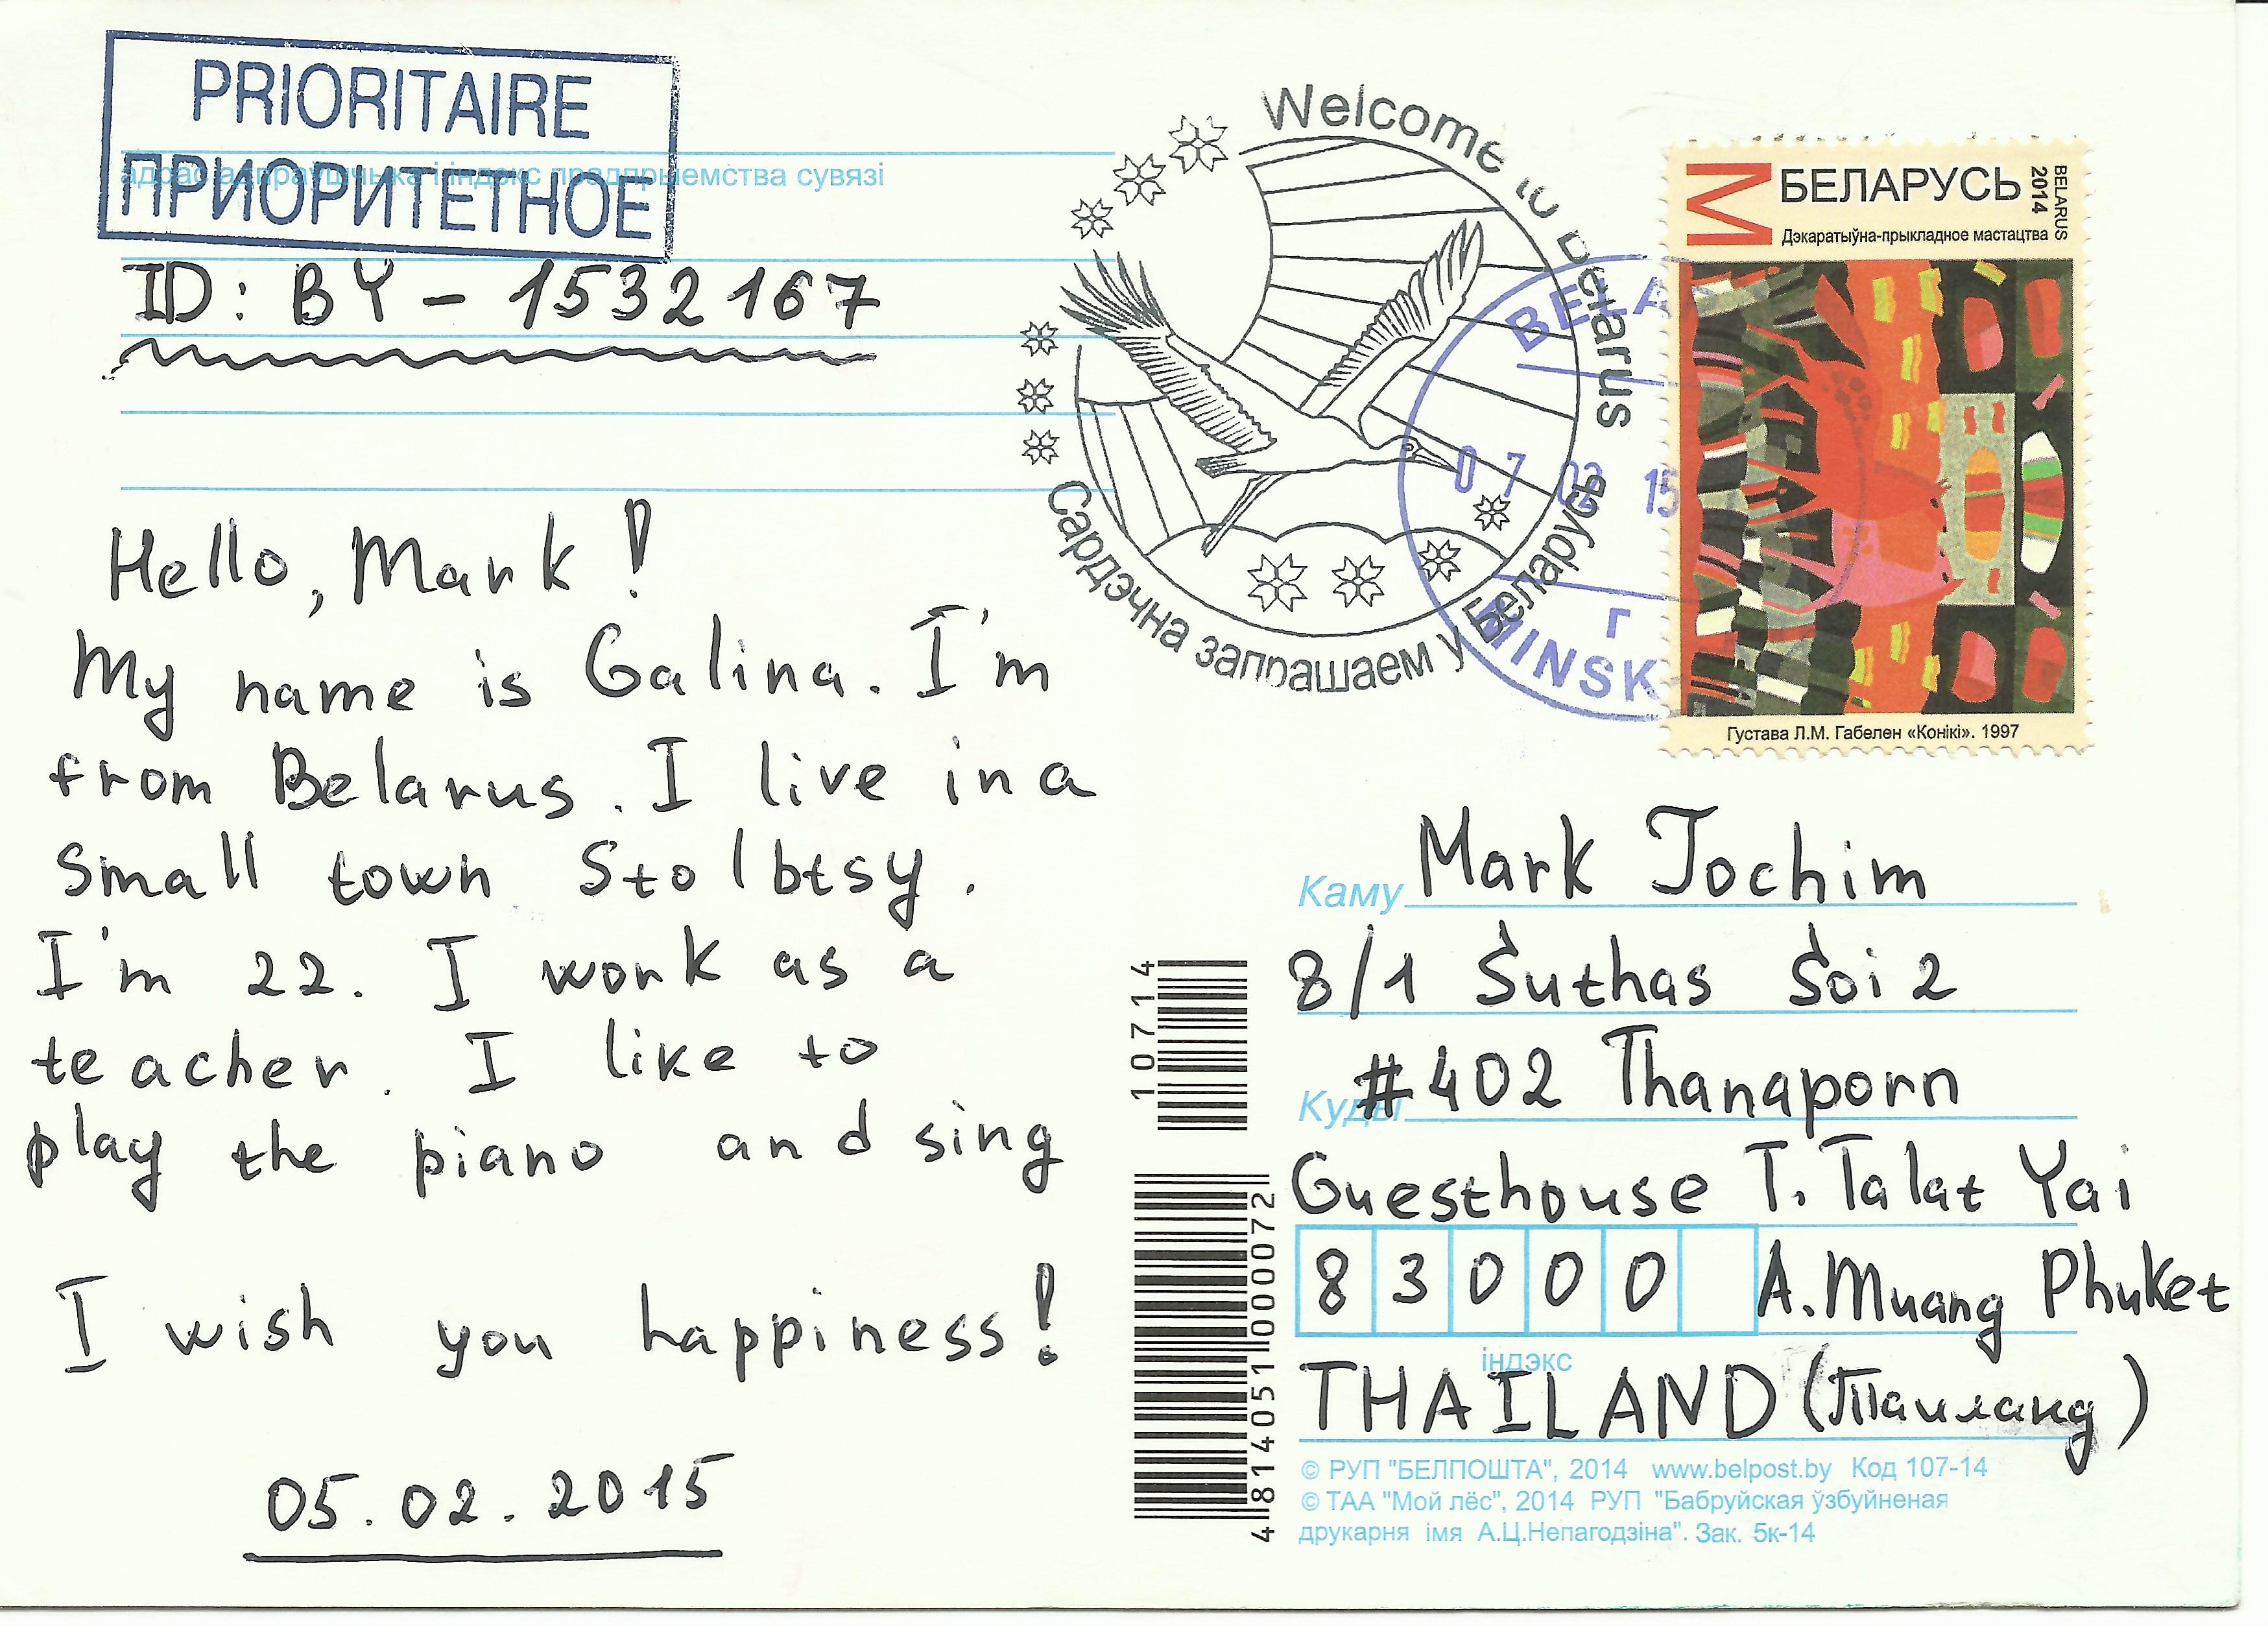 Belarus - Scott #886 (2014) on postcard received on February 28, 2015